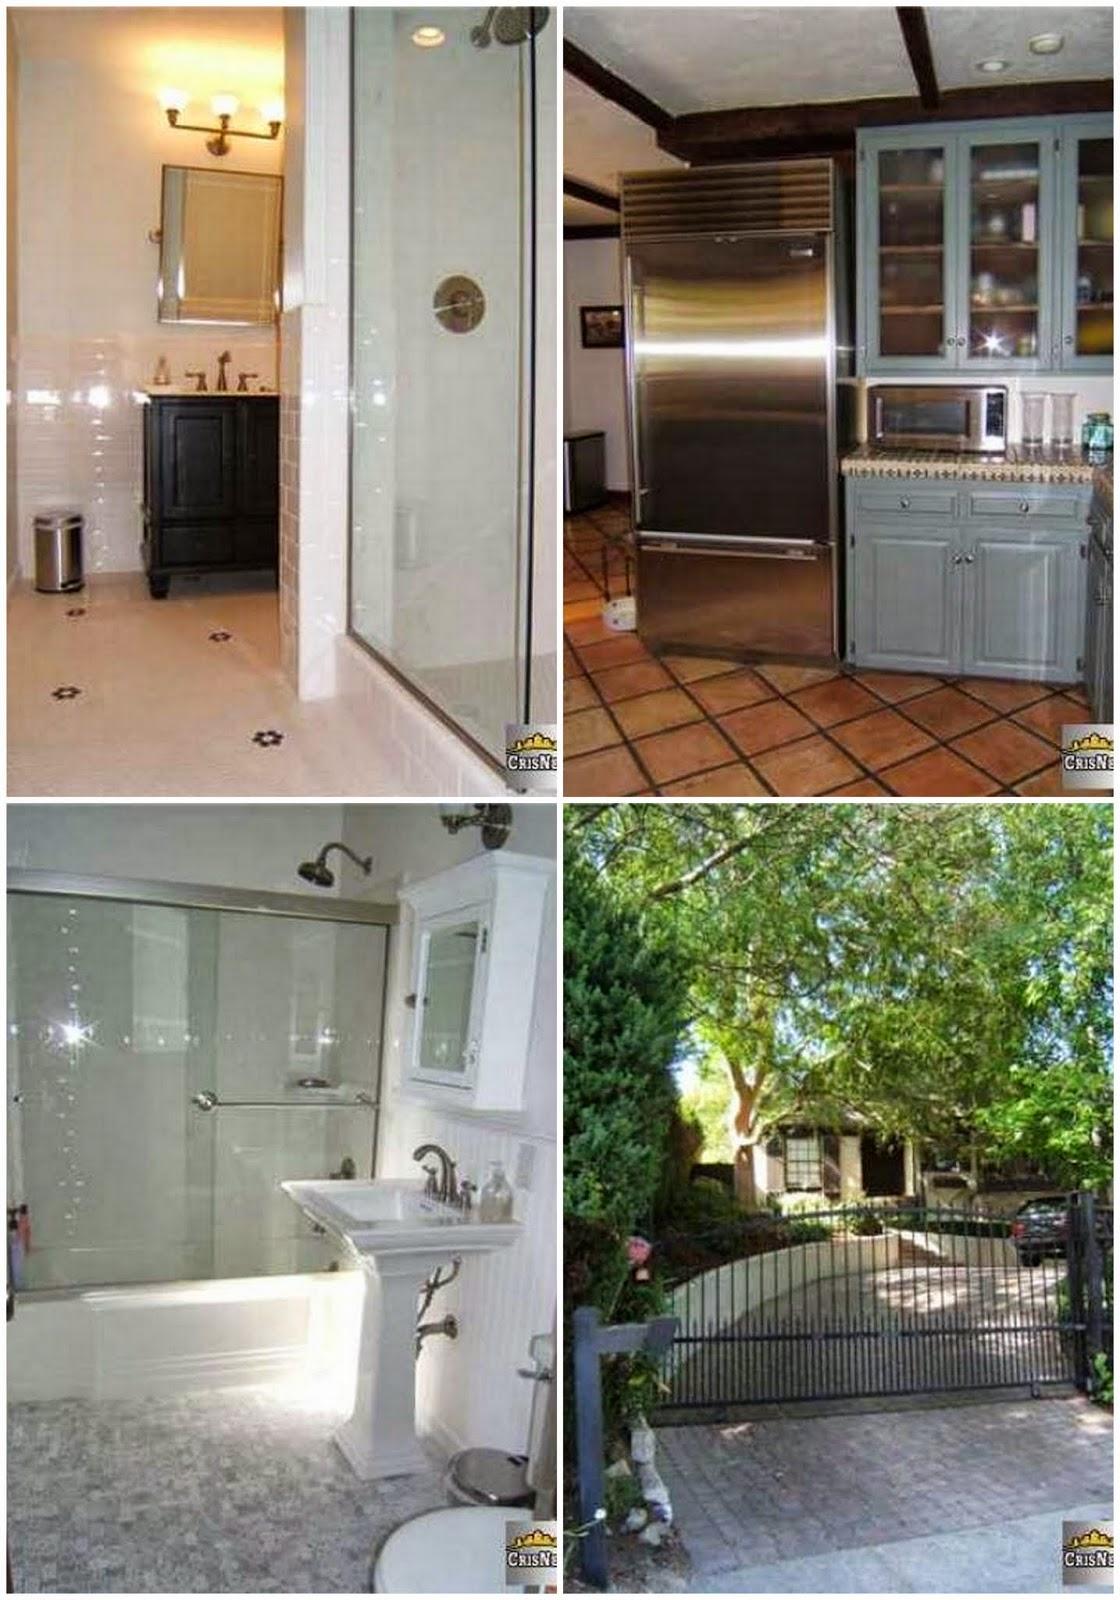 Bathroom Vanity Van Nuys celeb r.e.: live like a rock star in nikki sixx's of motley crue